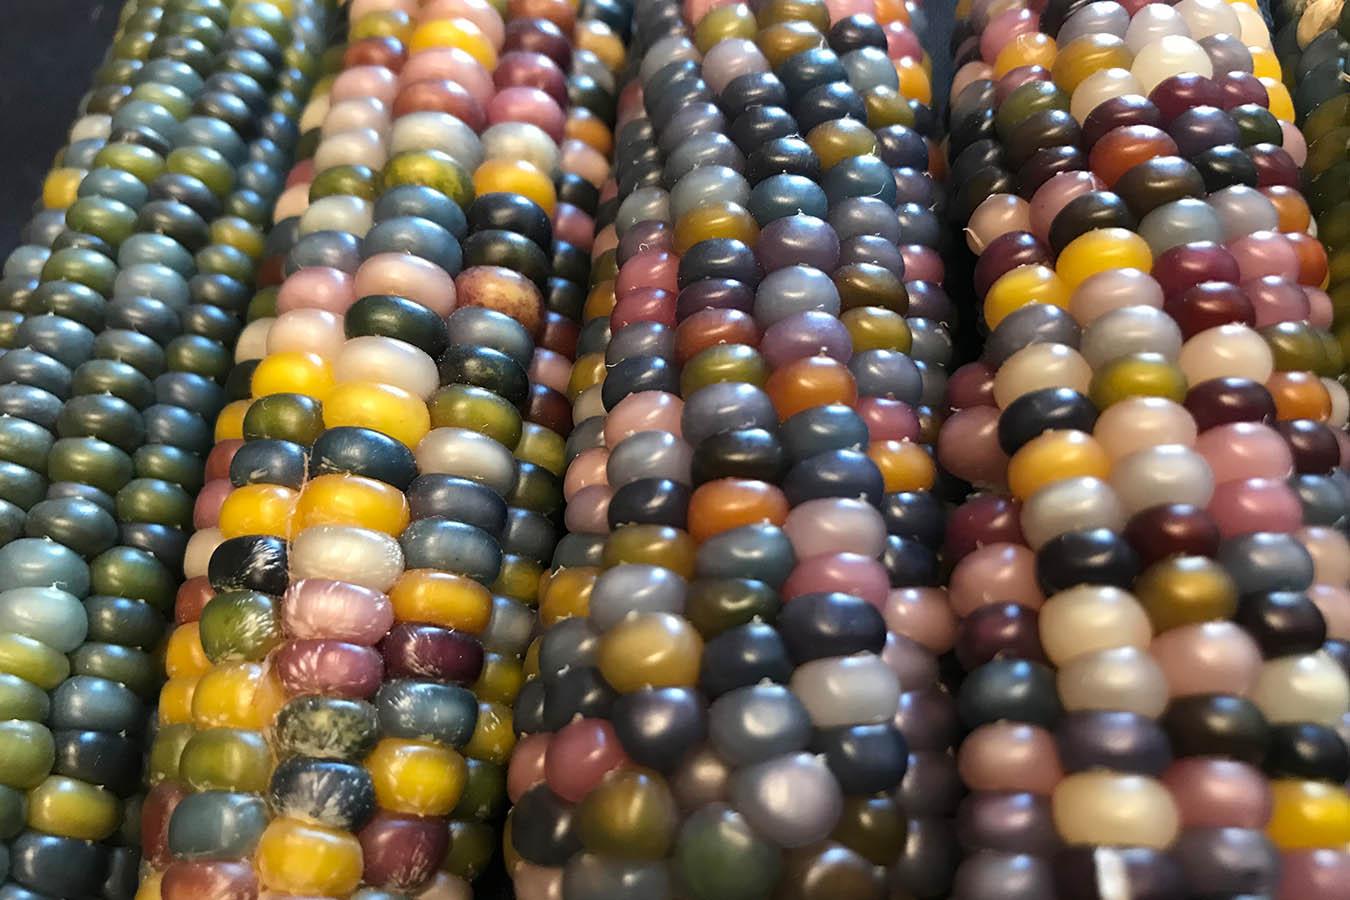 glass gem corn tipos de maiz maiz criollo  semillas de maiz